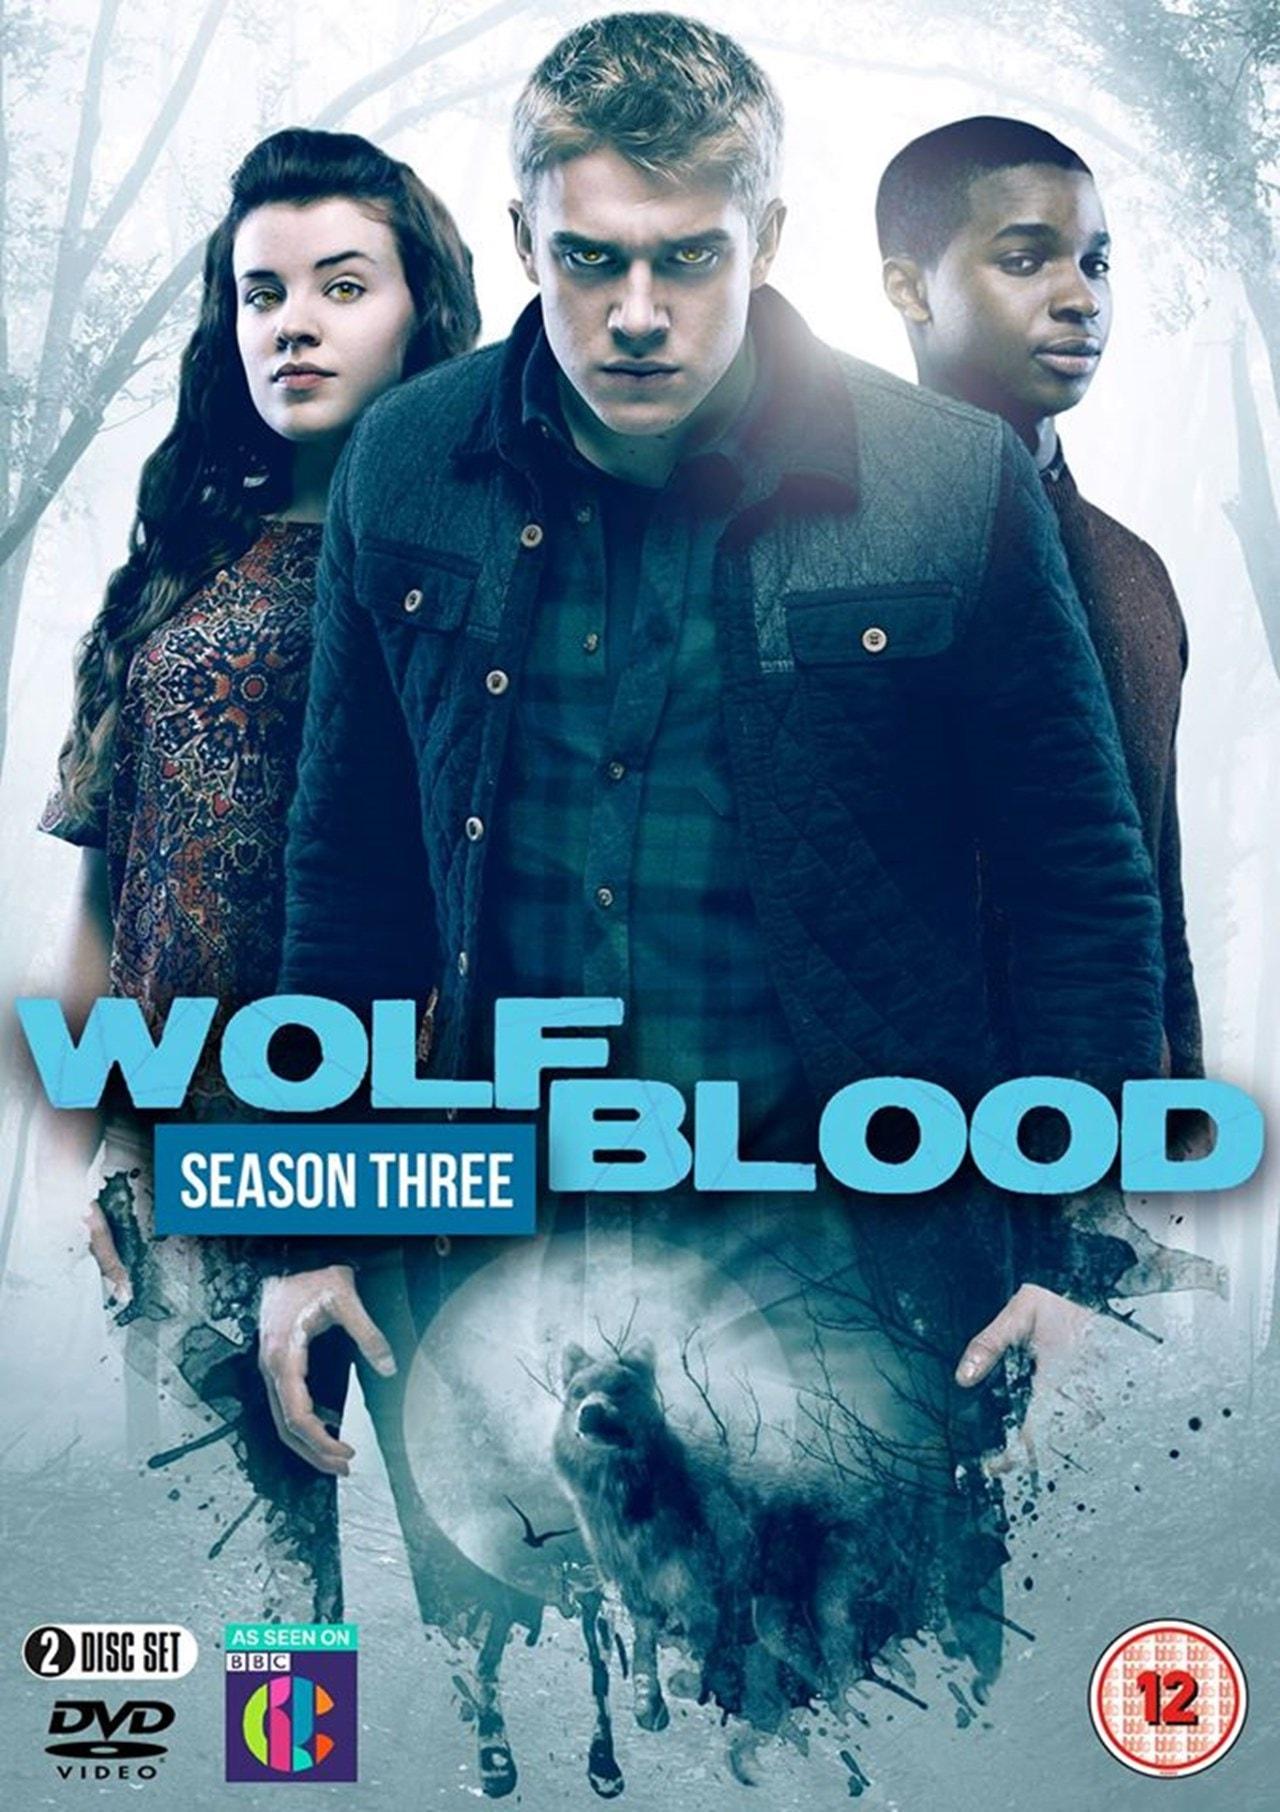 Wolfblood: Season 3 - 1